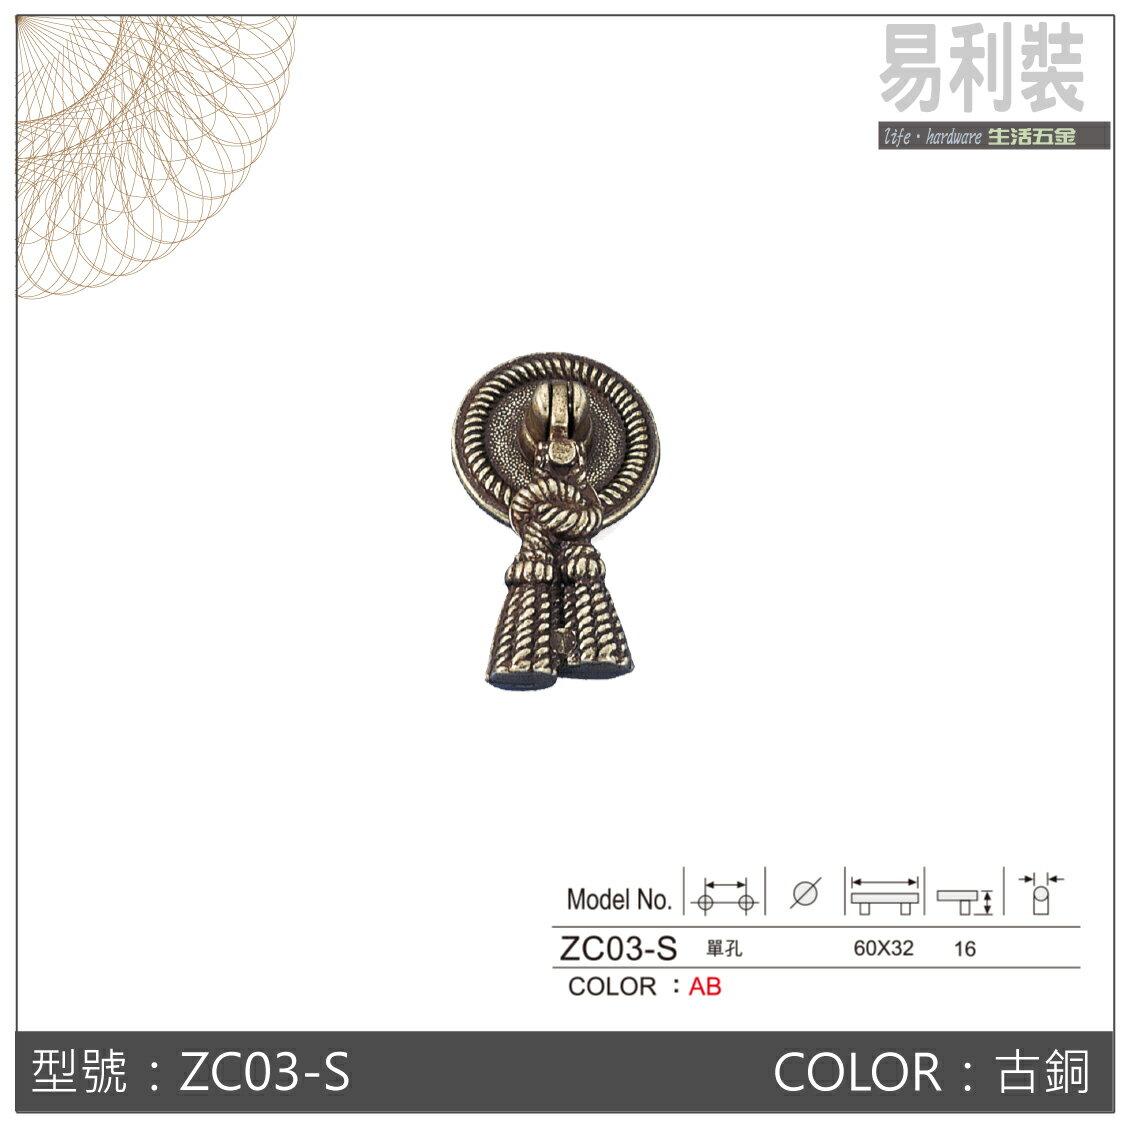 ZC03-S-古銅色 易利裝生活五金 櫥櫃抽屜把手取手 古典把手 復古把手 鋅合金把手